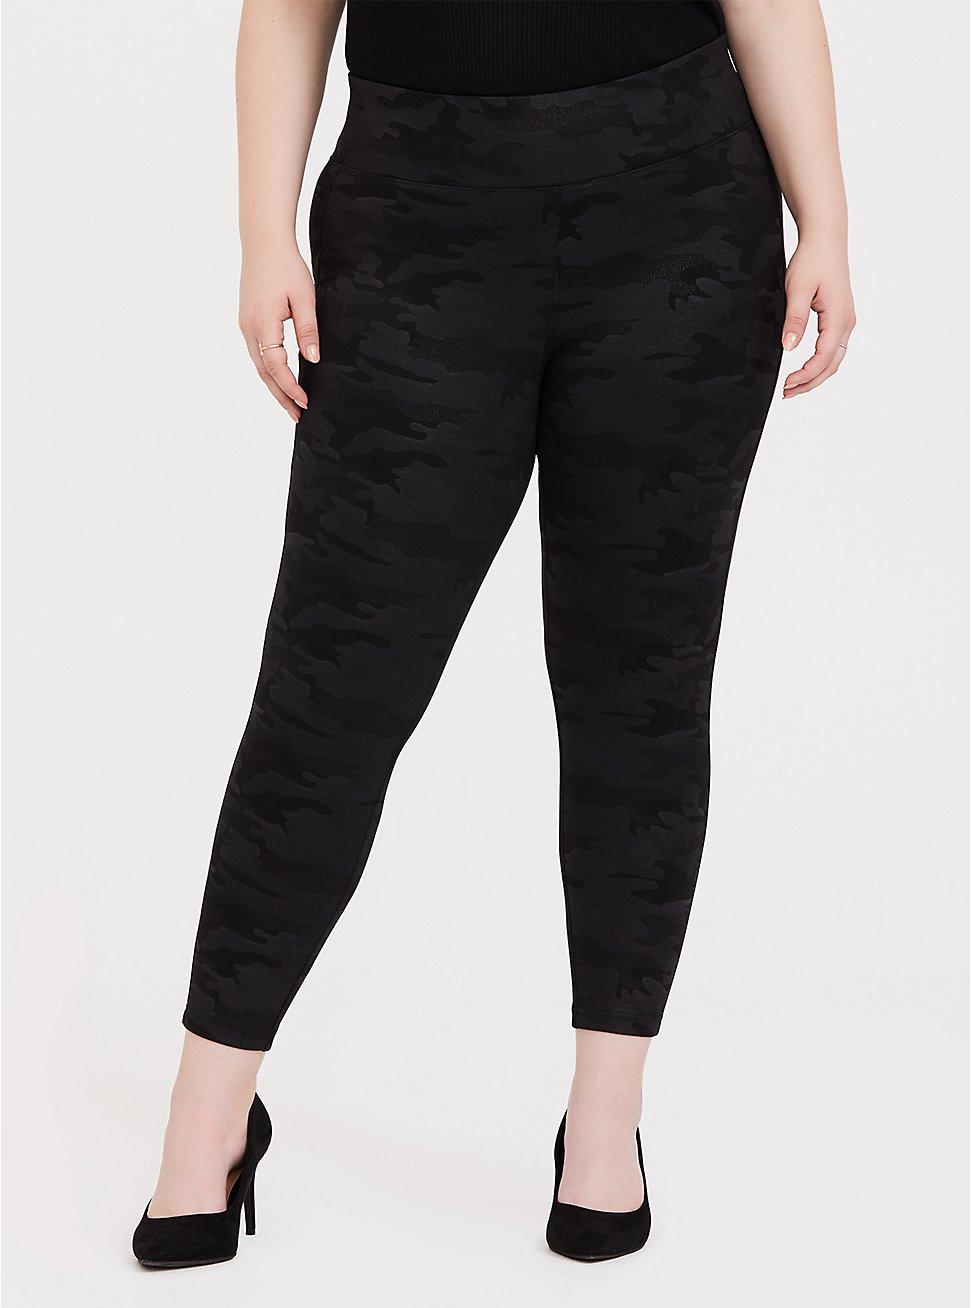 Premium Ponte Pull-On Pixie Pant - Black Camo 4